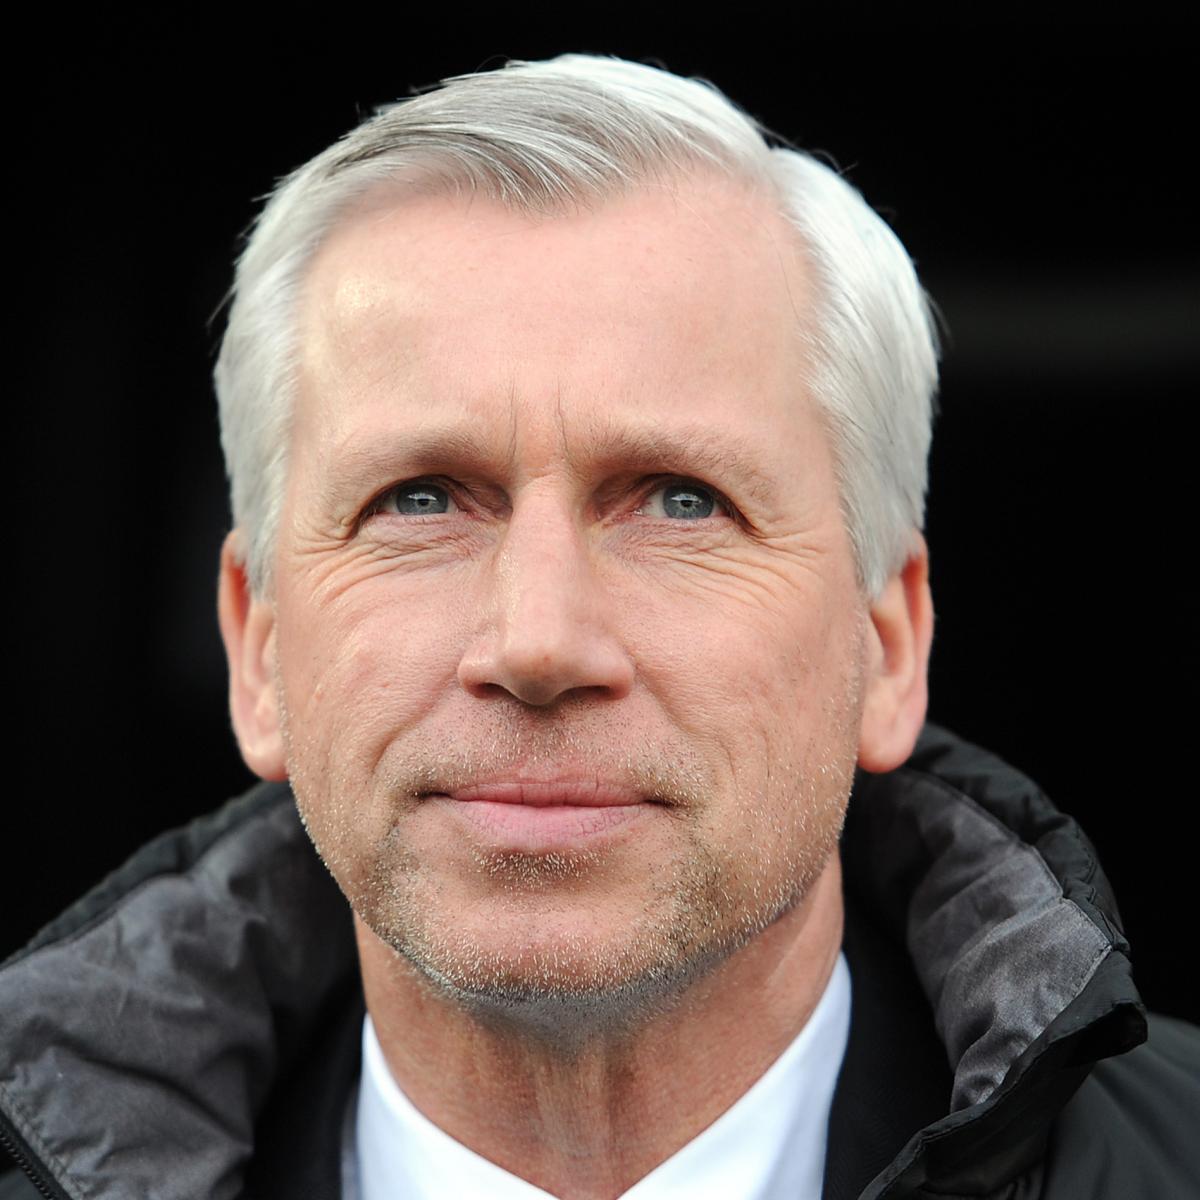 Ajax Vs Tottenham Hotspur Preview Live Stream Tv Info: Newcastle Vs. Tottenham: Date, Time, Live Stream, TV Info